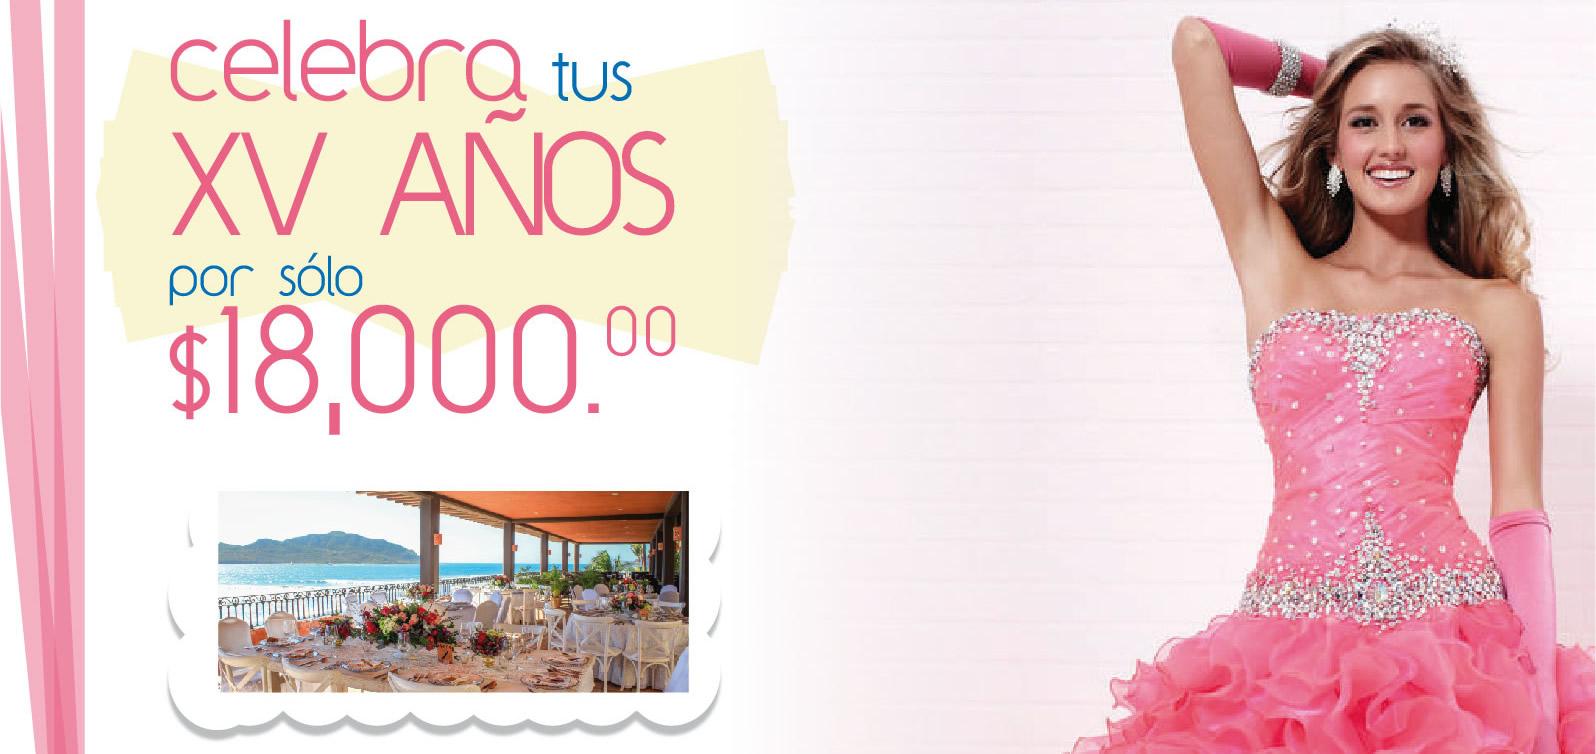 Celebra tus XV años en Hotel Playa Mazatlán